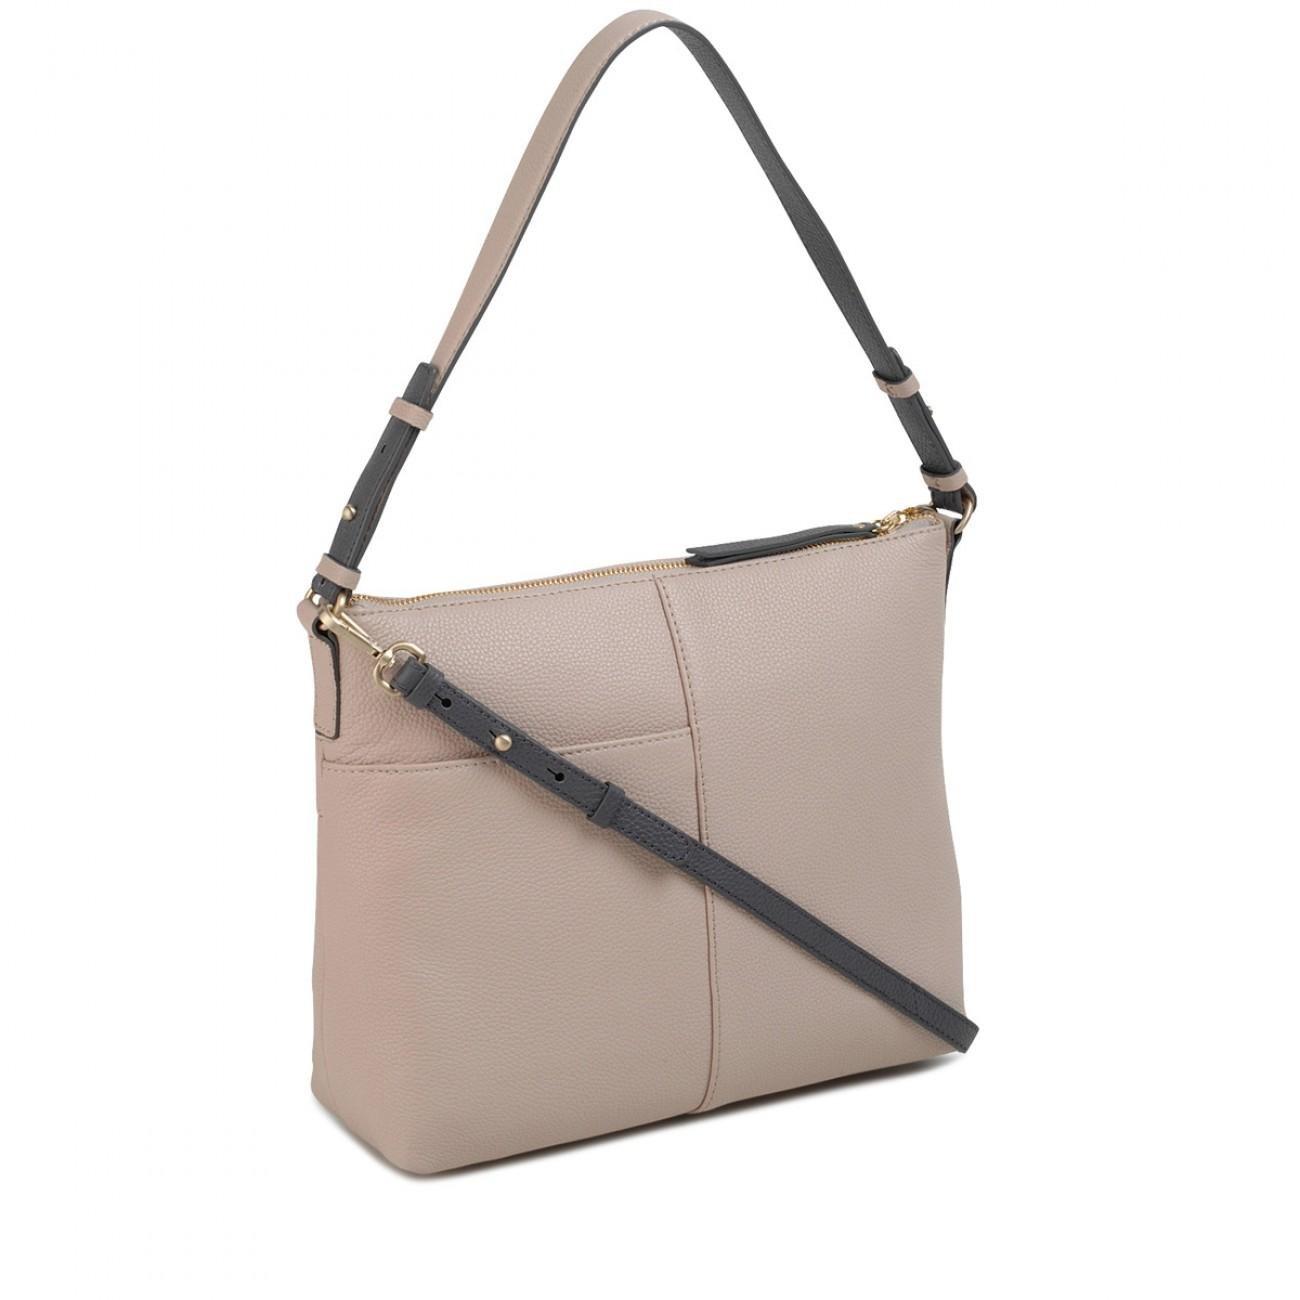 36716c3c364a Radley - Gray Smith Street Medium Zip-top Multiway Shoulder Bag - Lyst.  View fullscreen